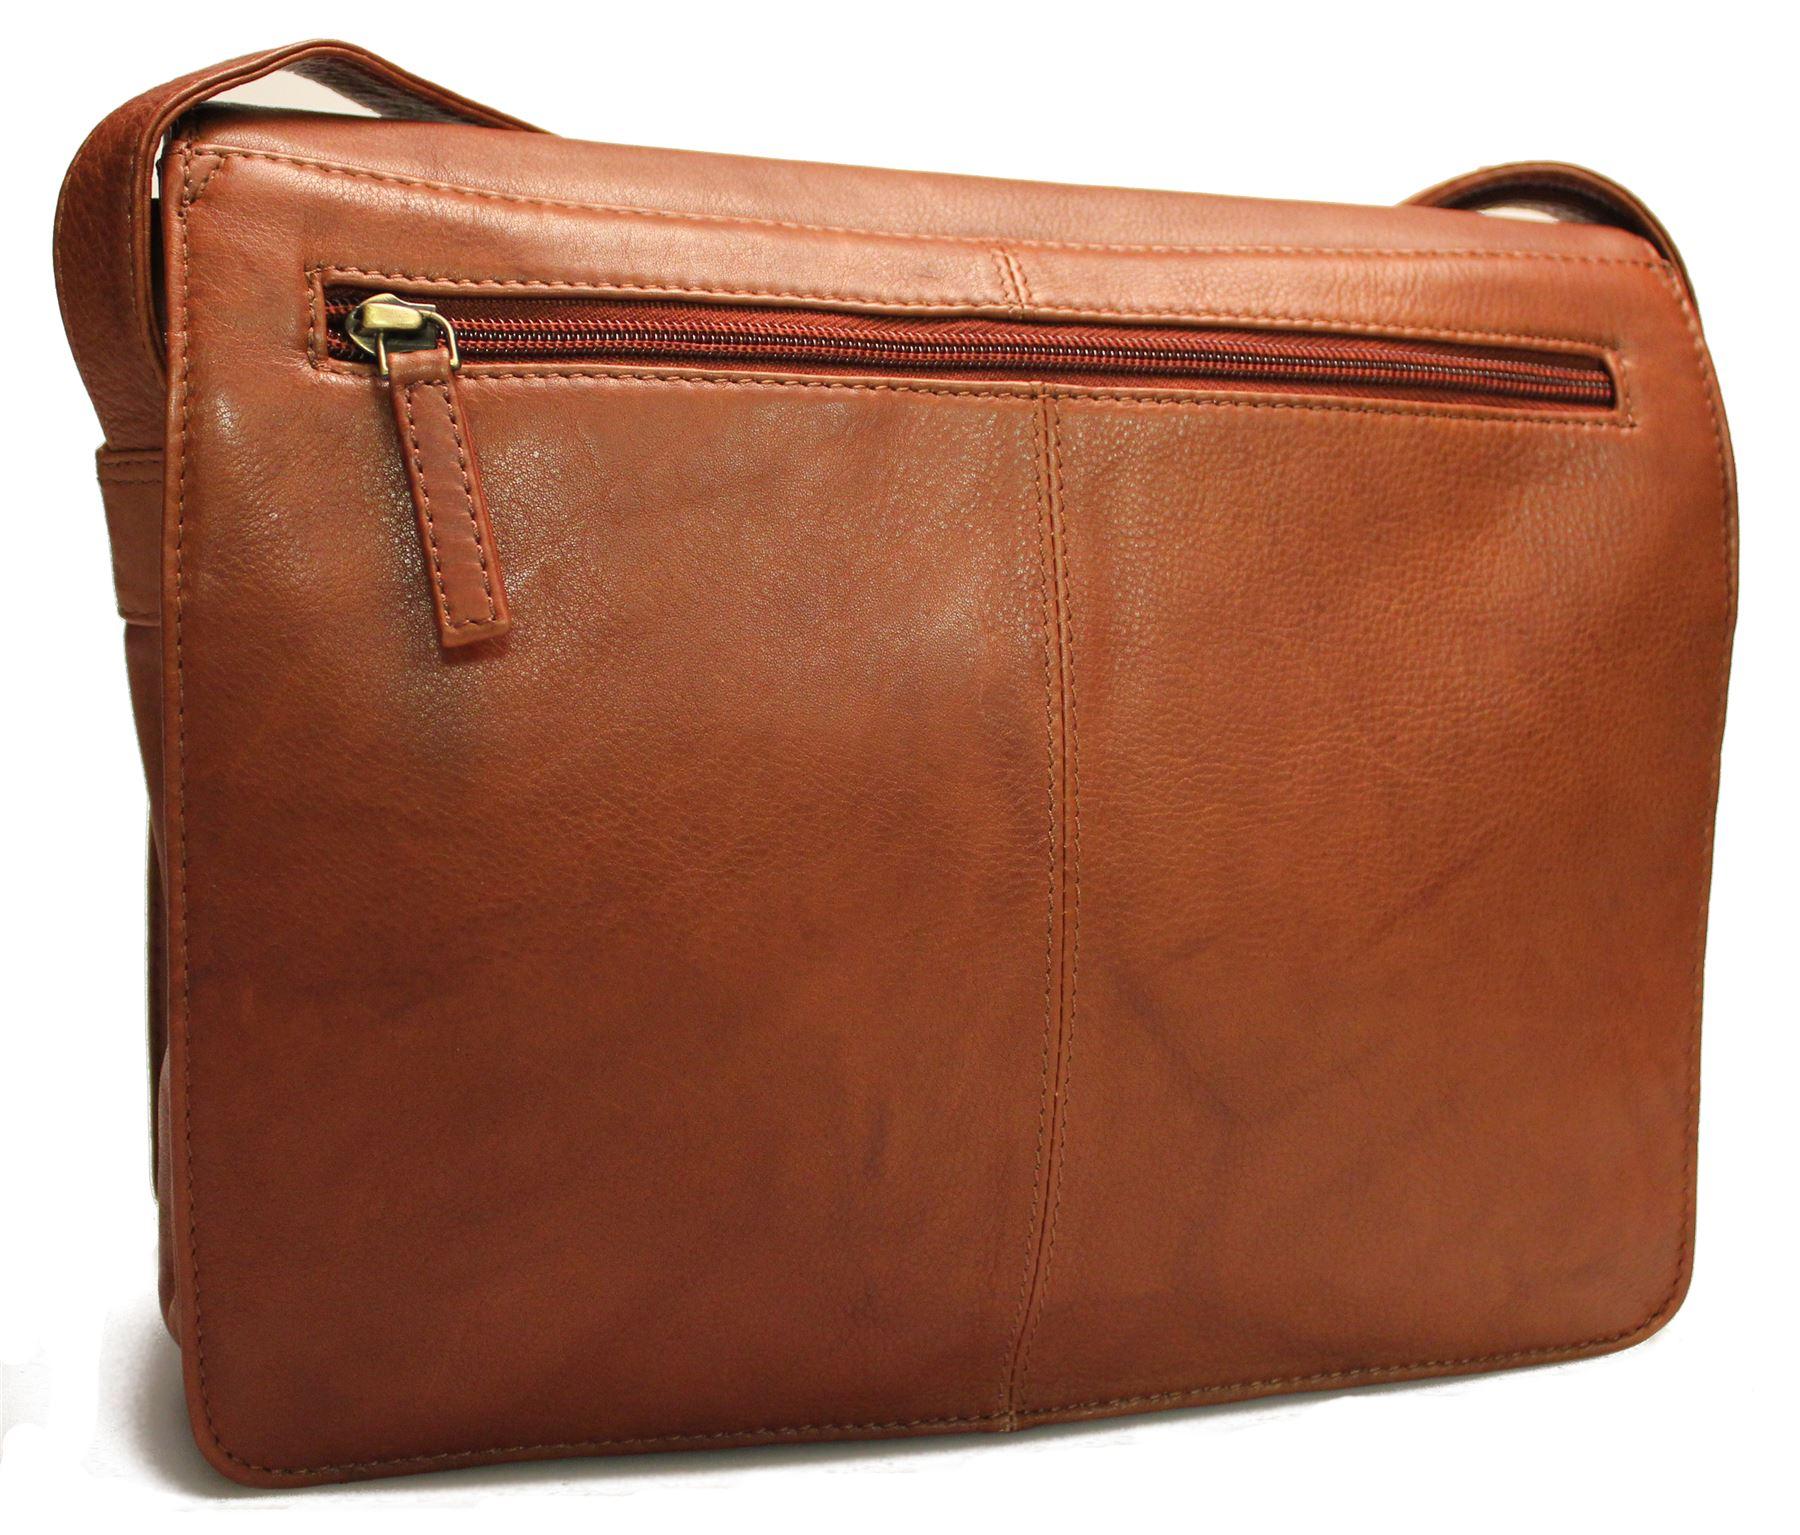 Visconti-Ladies-Soft-Leather-Messenger-Bag-Medium-Cross-Body-Shoulder-TESS-M-754